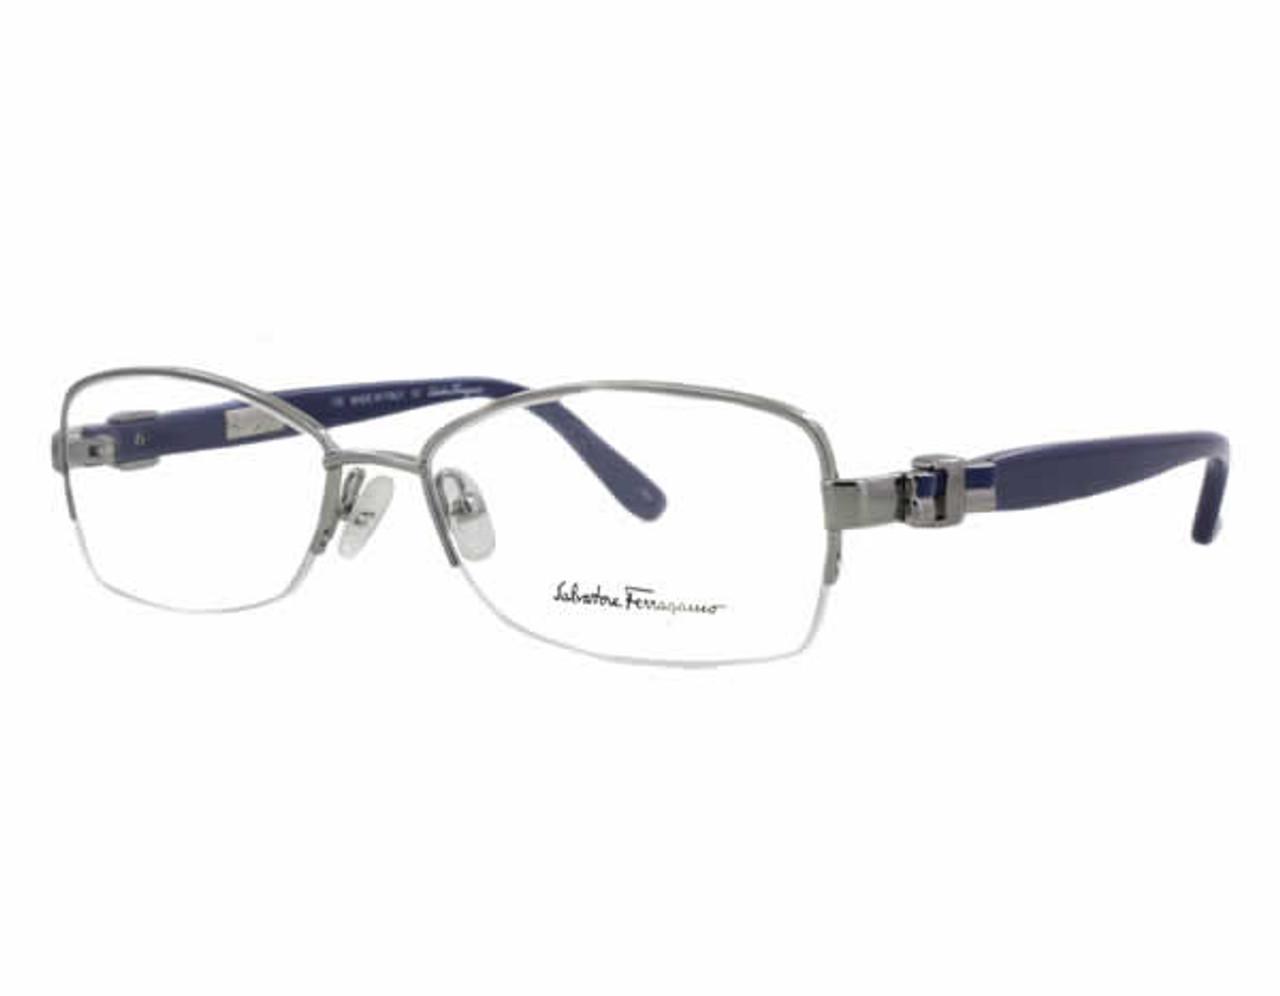 e766def734 Salvatore Ferragamo Designer Eyeglasses 2101 in Silver-Blue    Rx Bi ...